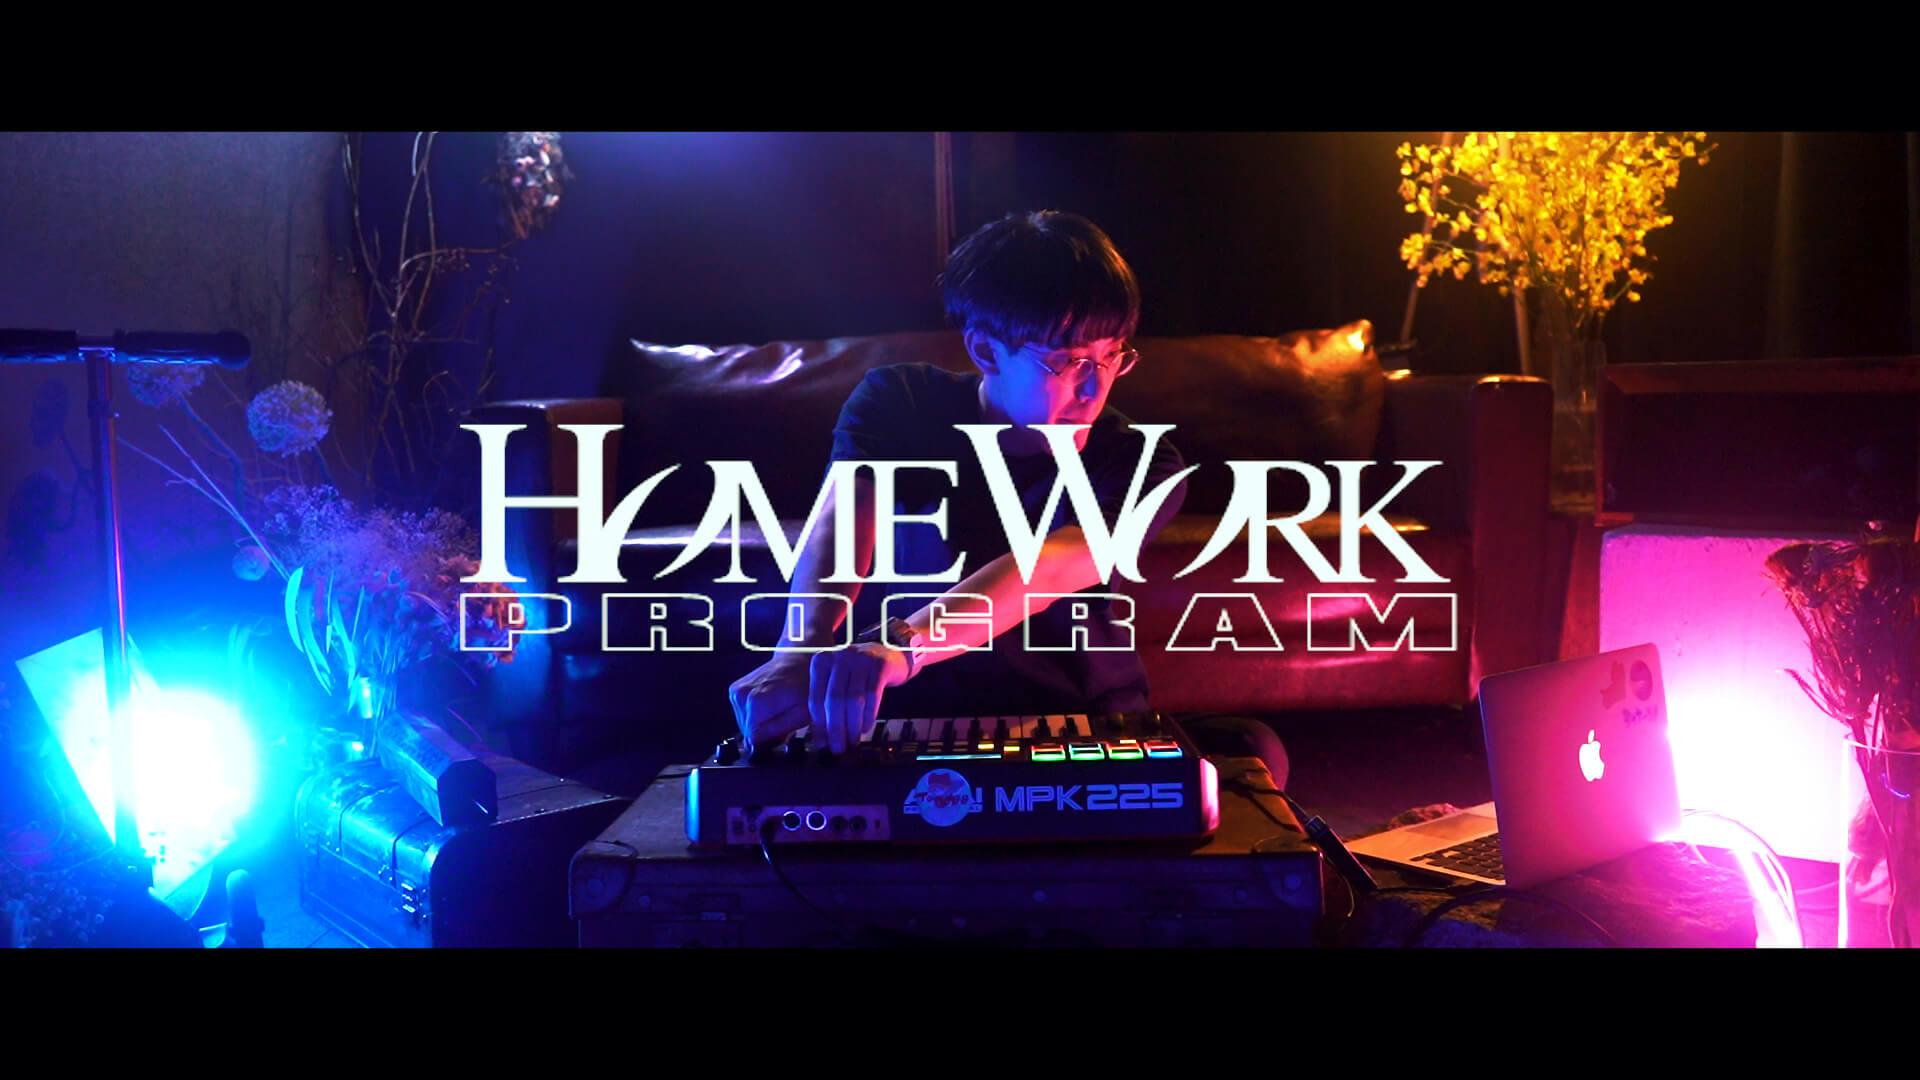 Seihoが謎の部屋の中で行われるライブ配信『HOMEWORK PROGRAM』最終回に登場!夜明けに向けてライブを披露 music200626_homeworkprogram_seiho_03